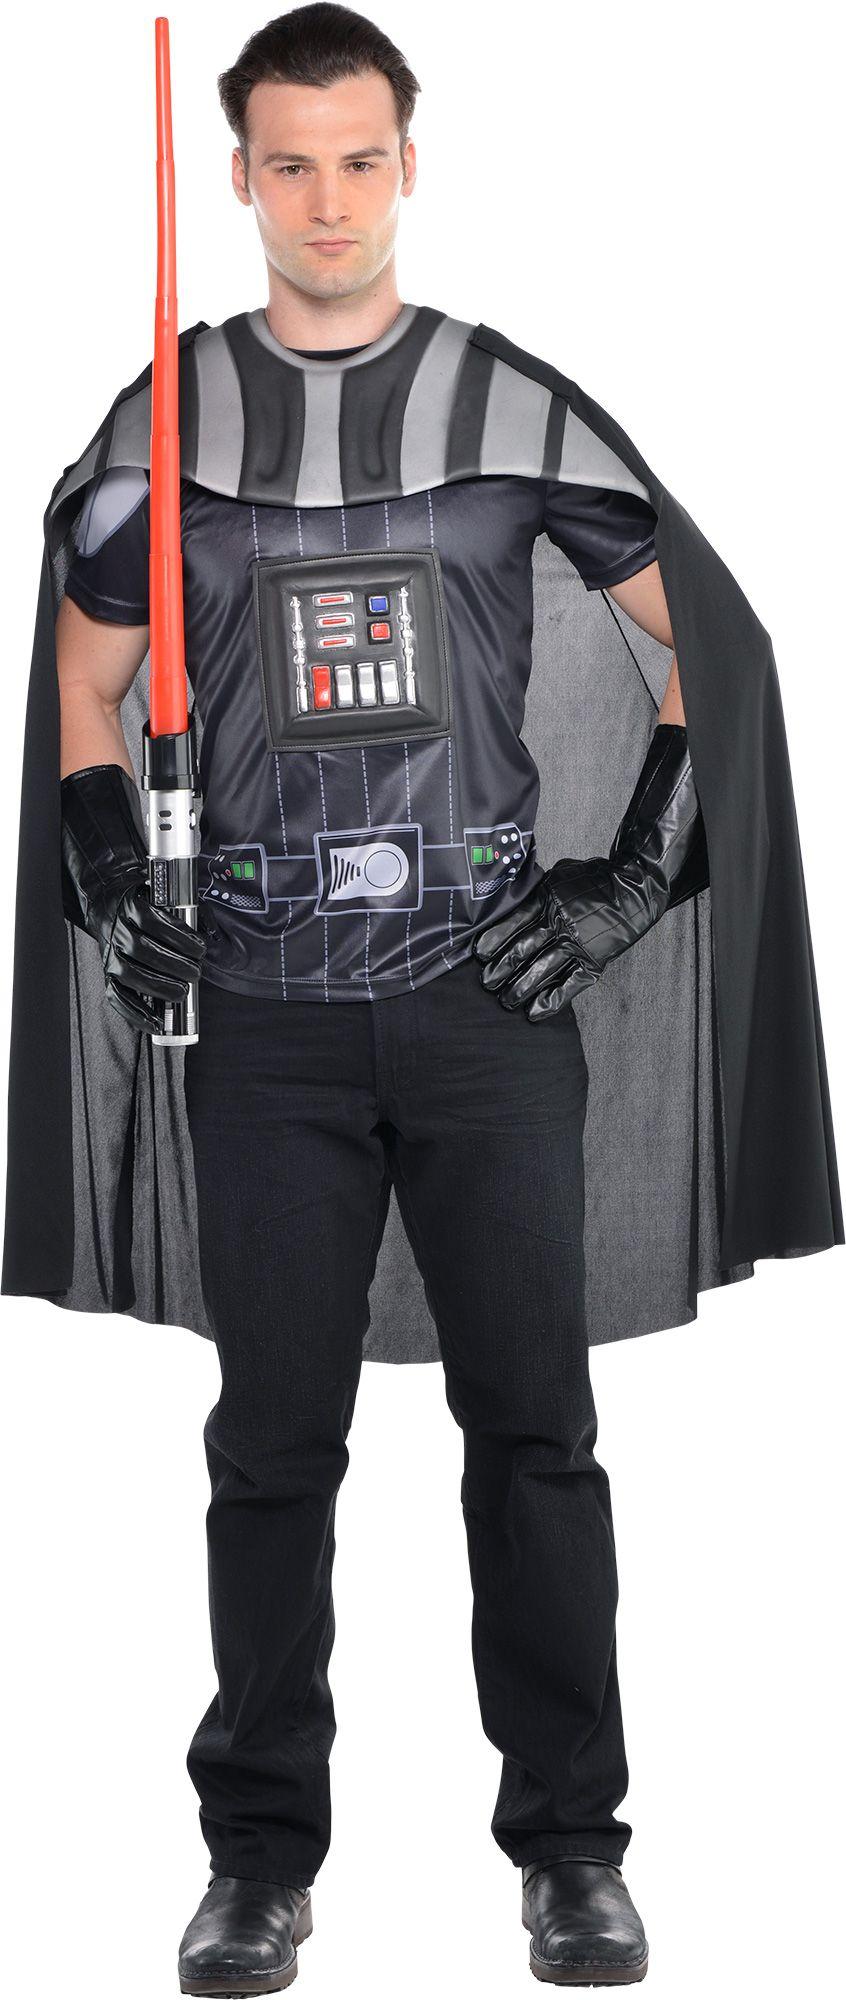 Make Your Costume - Mens Darth Vader #2